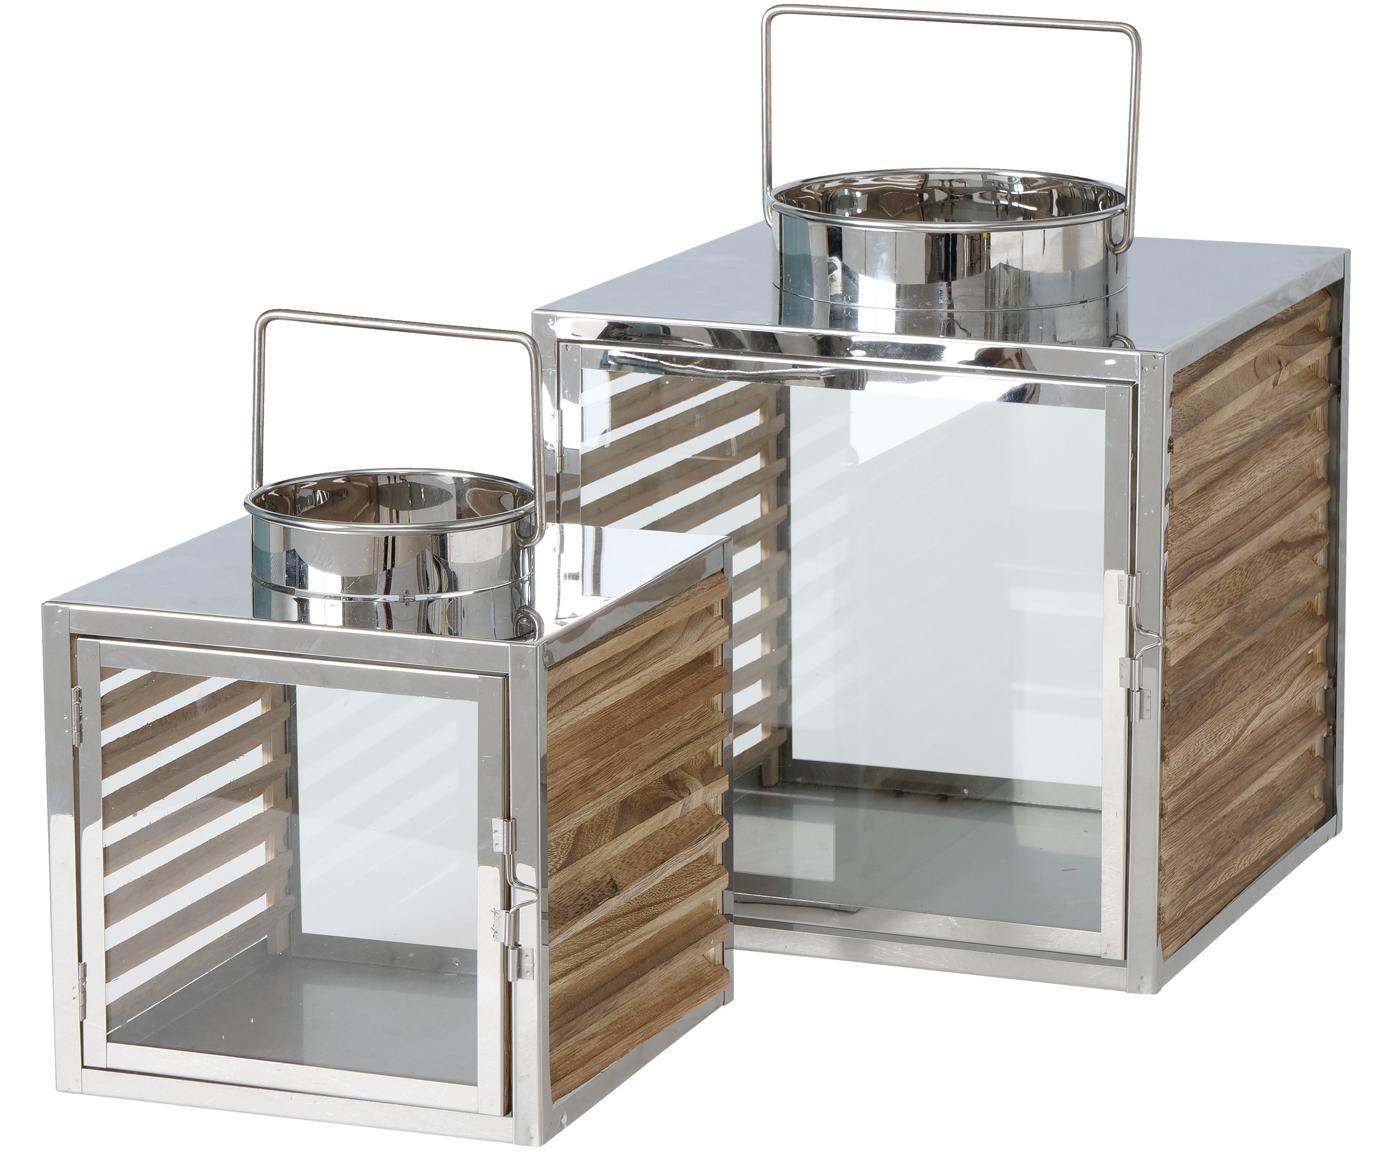 Laternen-Set Malmok, 2-tlg., Edelstahl, Holz, Glas, Silberfarben, Sondergrößen